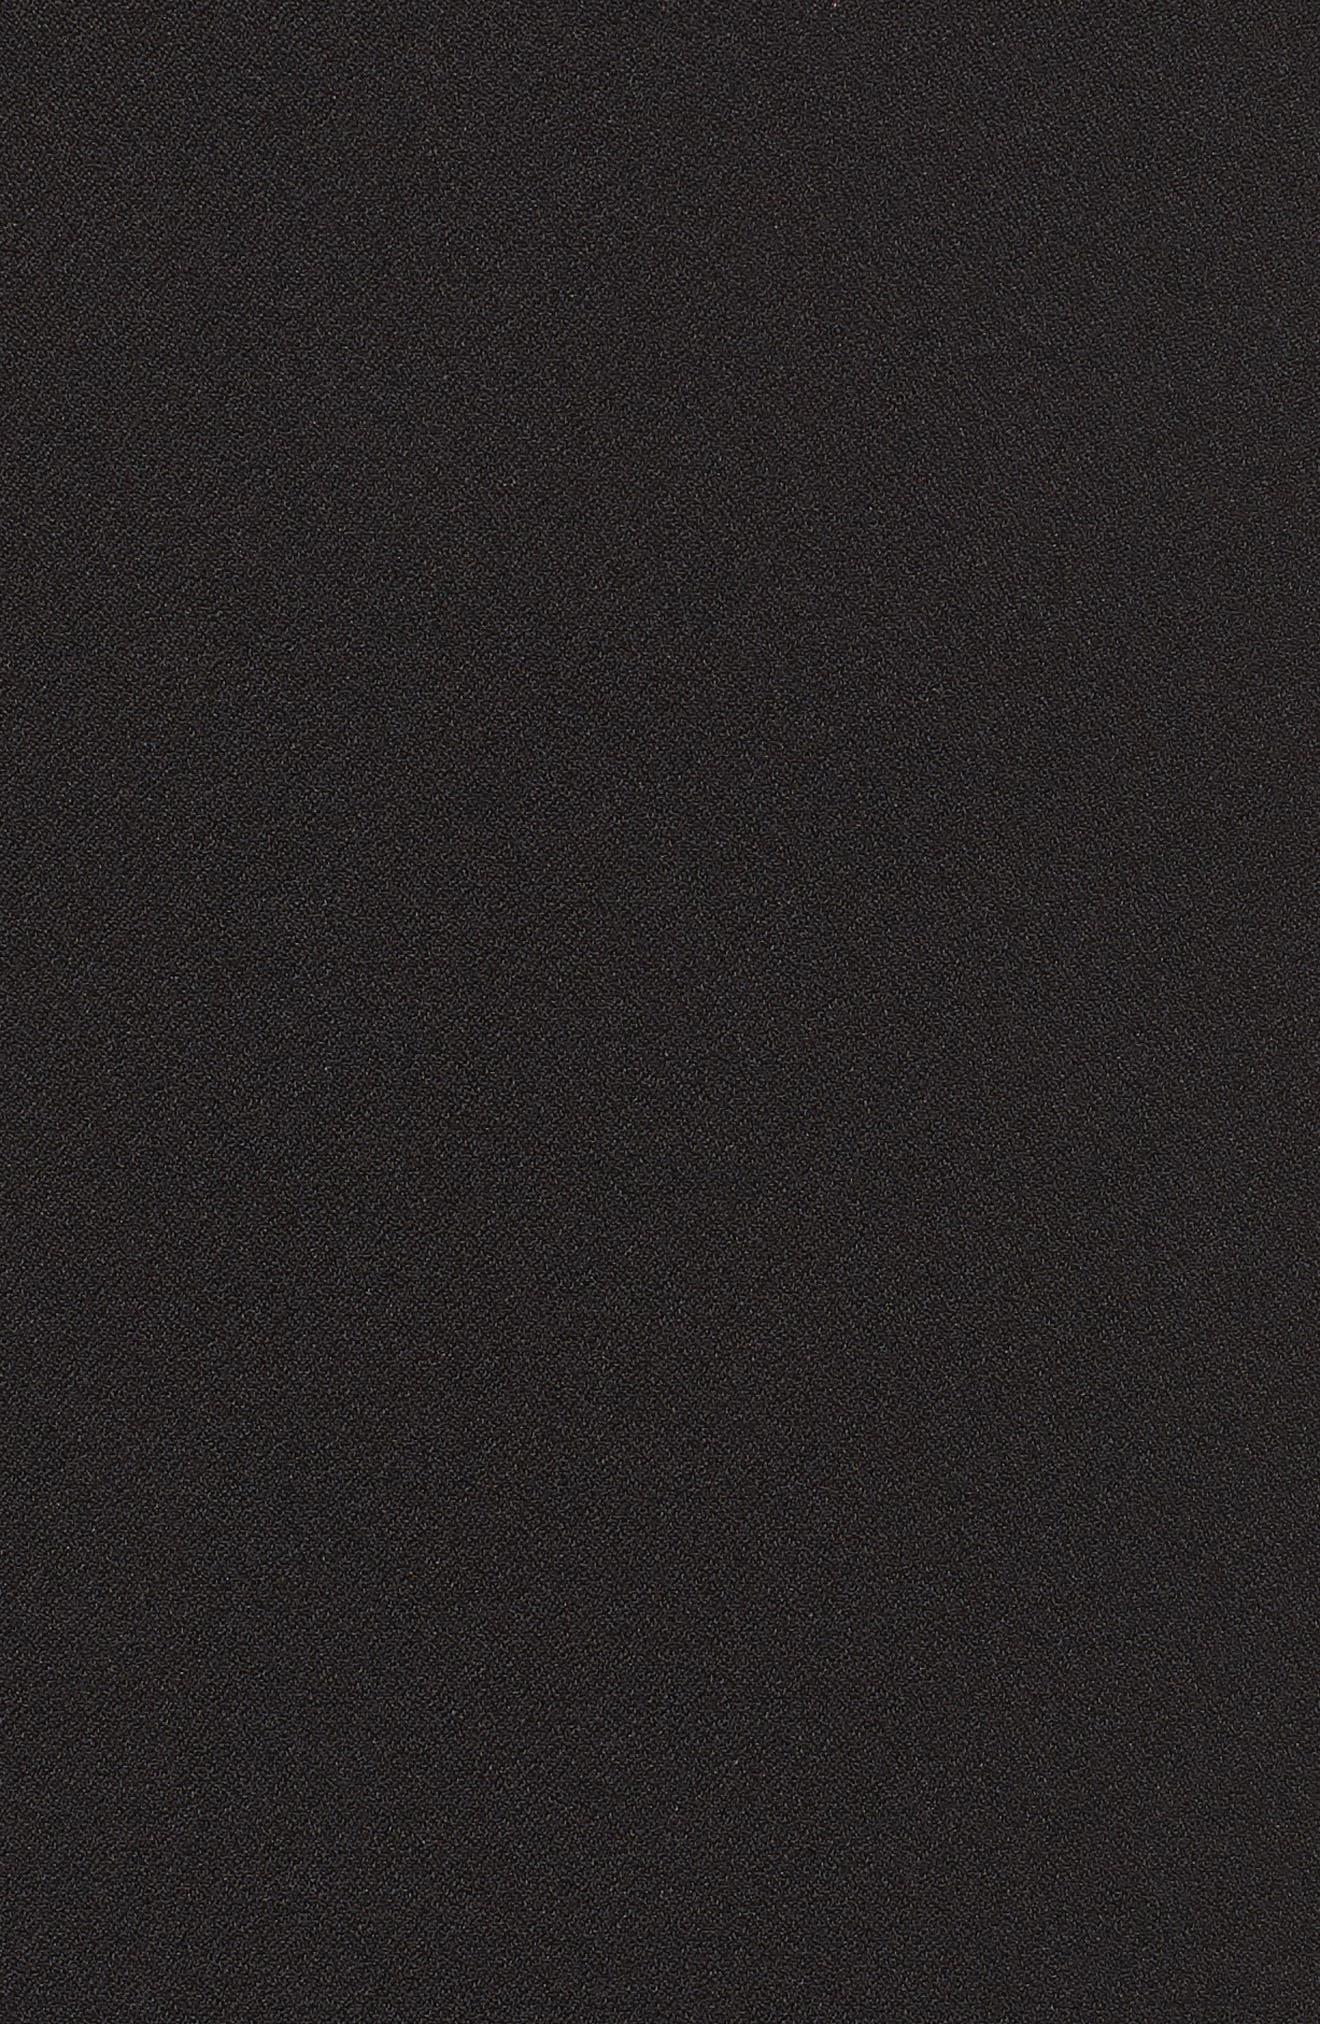 Asymmetric Ruffle Hem Dress,                             Alternate thumbnail 7, color,                             001